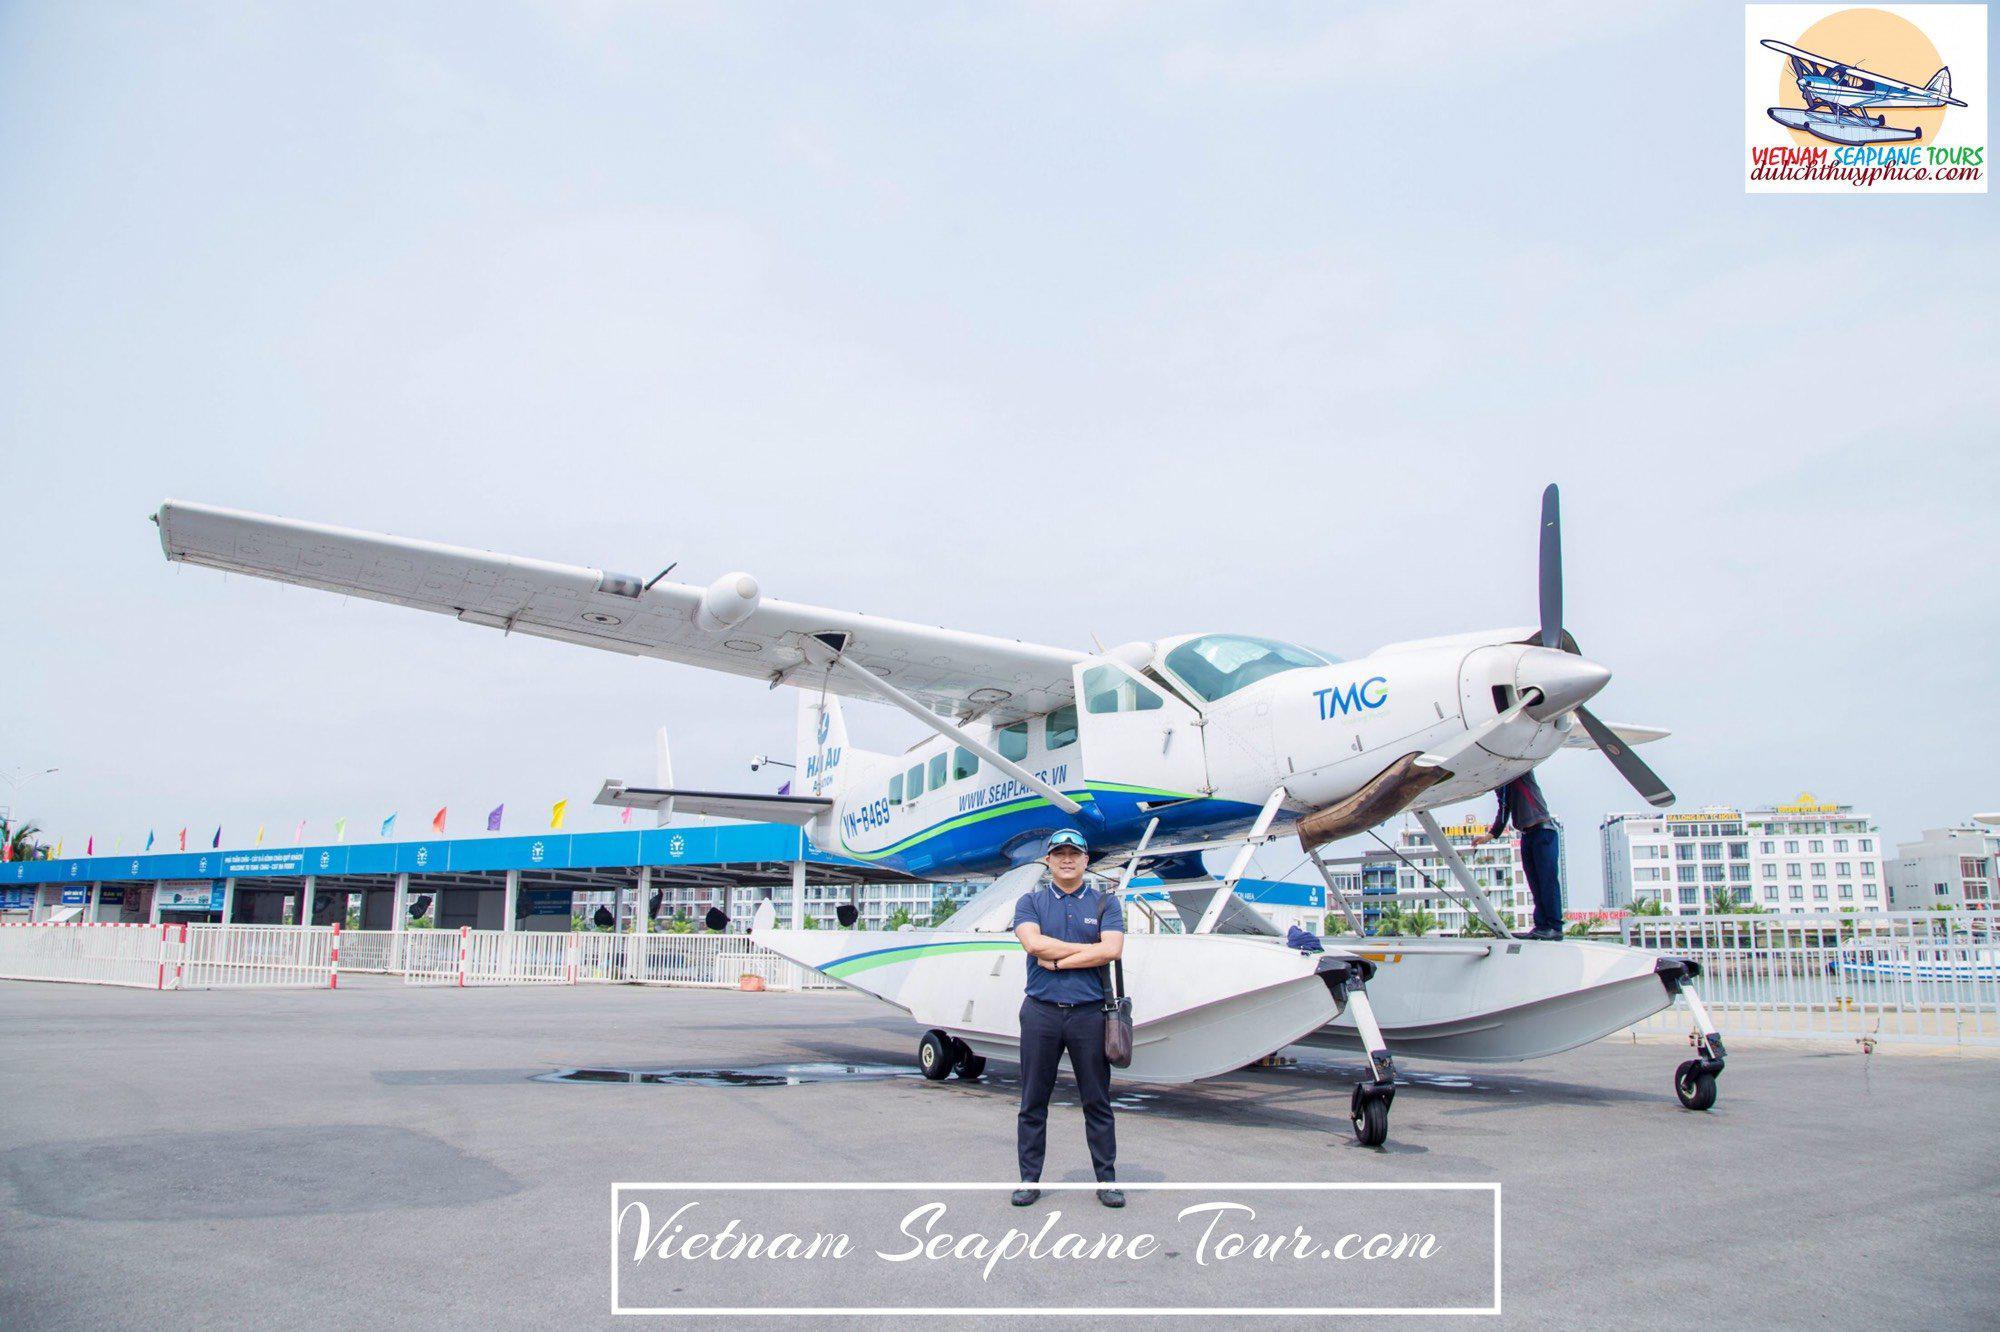 Seaplane From Saigon to Can Tho